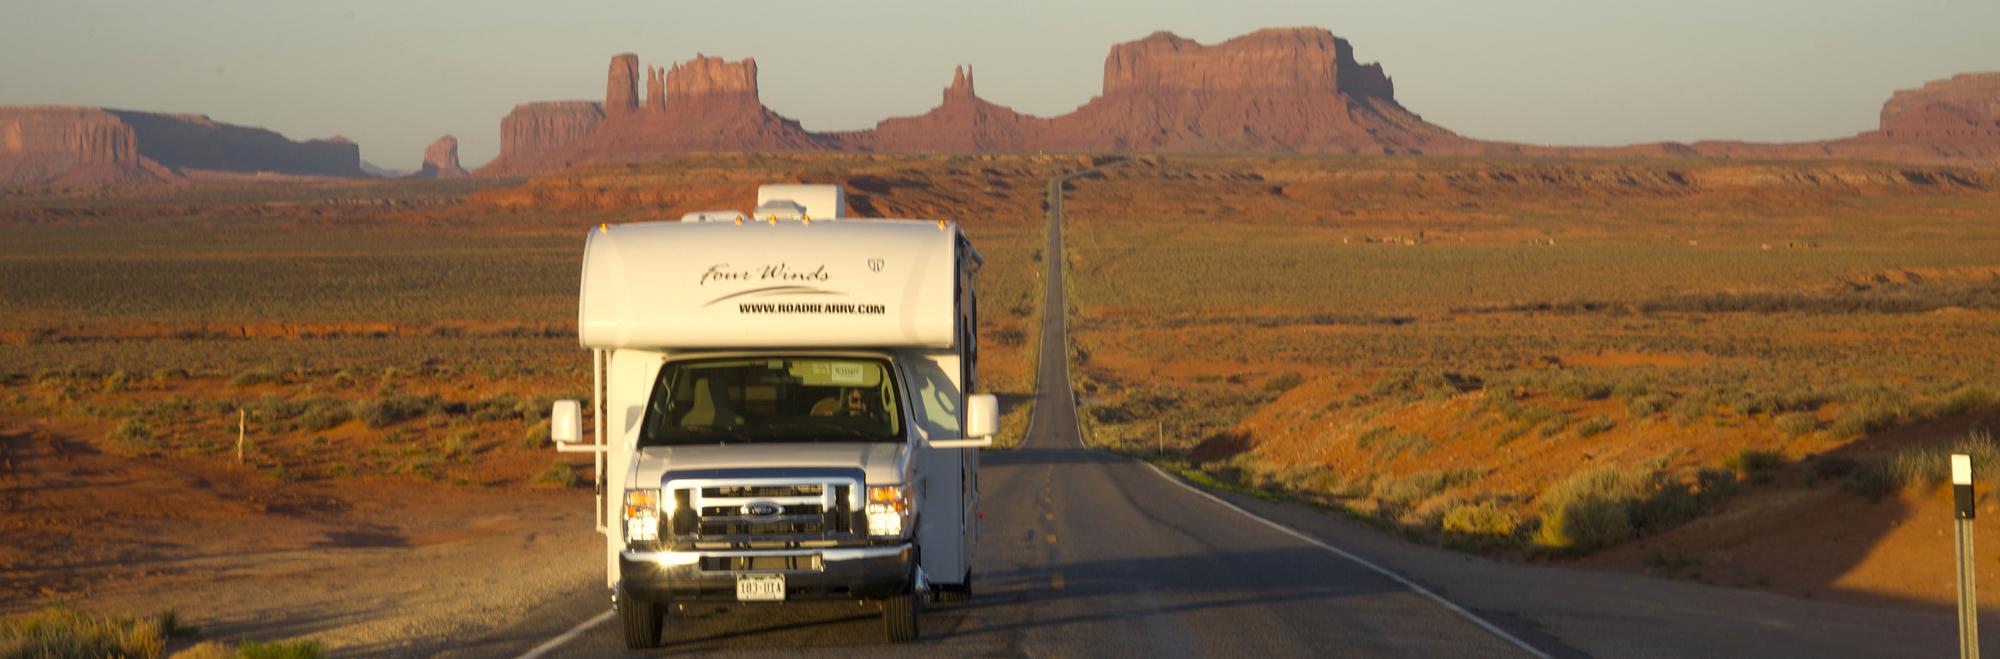 Road Bear Motorhome rentals